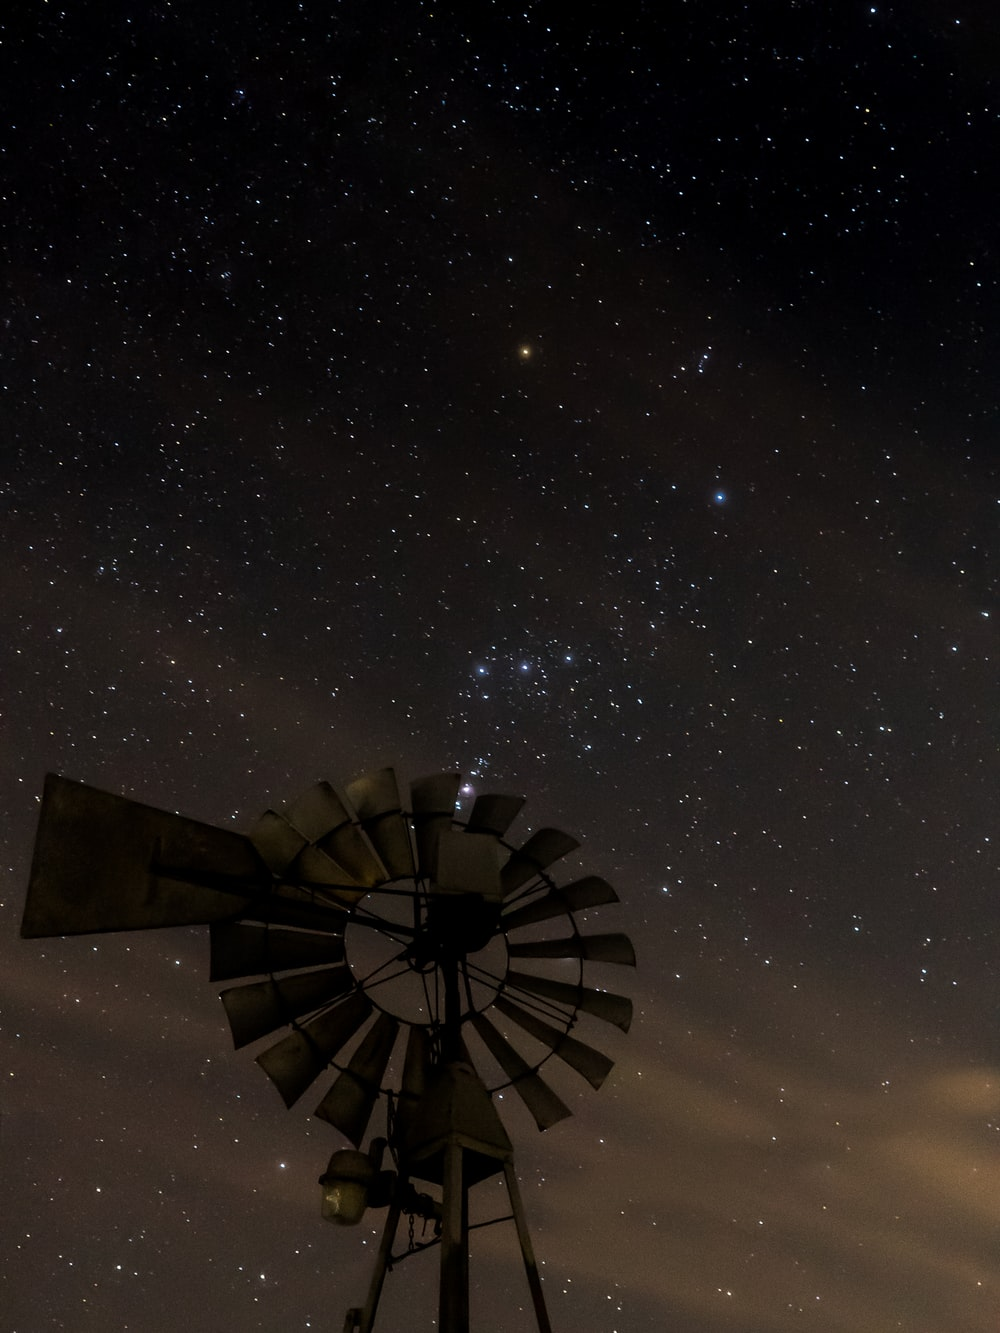 brown wooden windmill under starry night